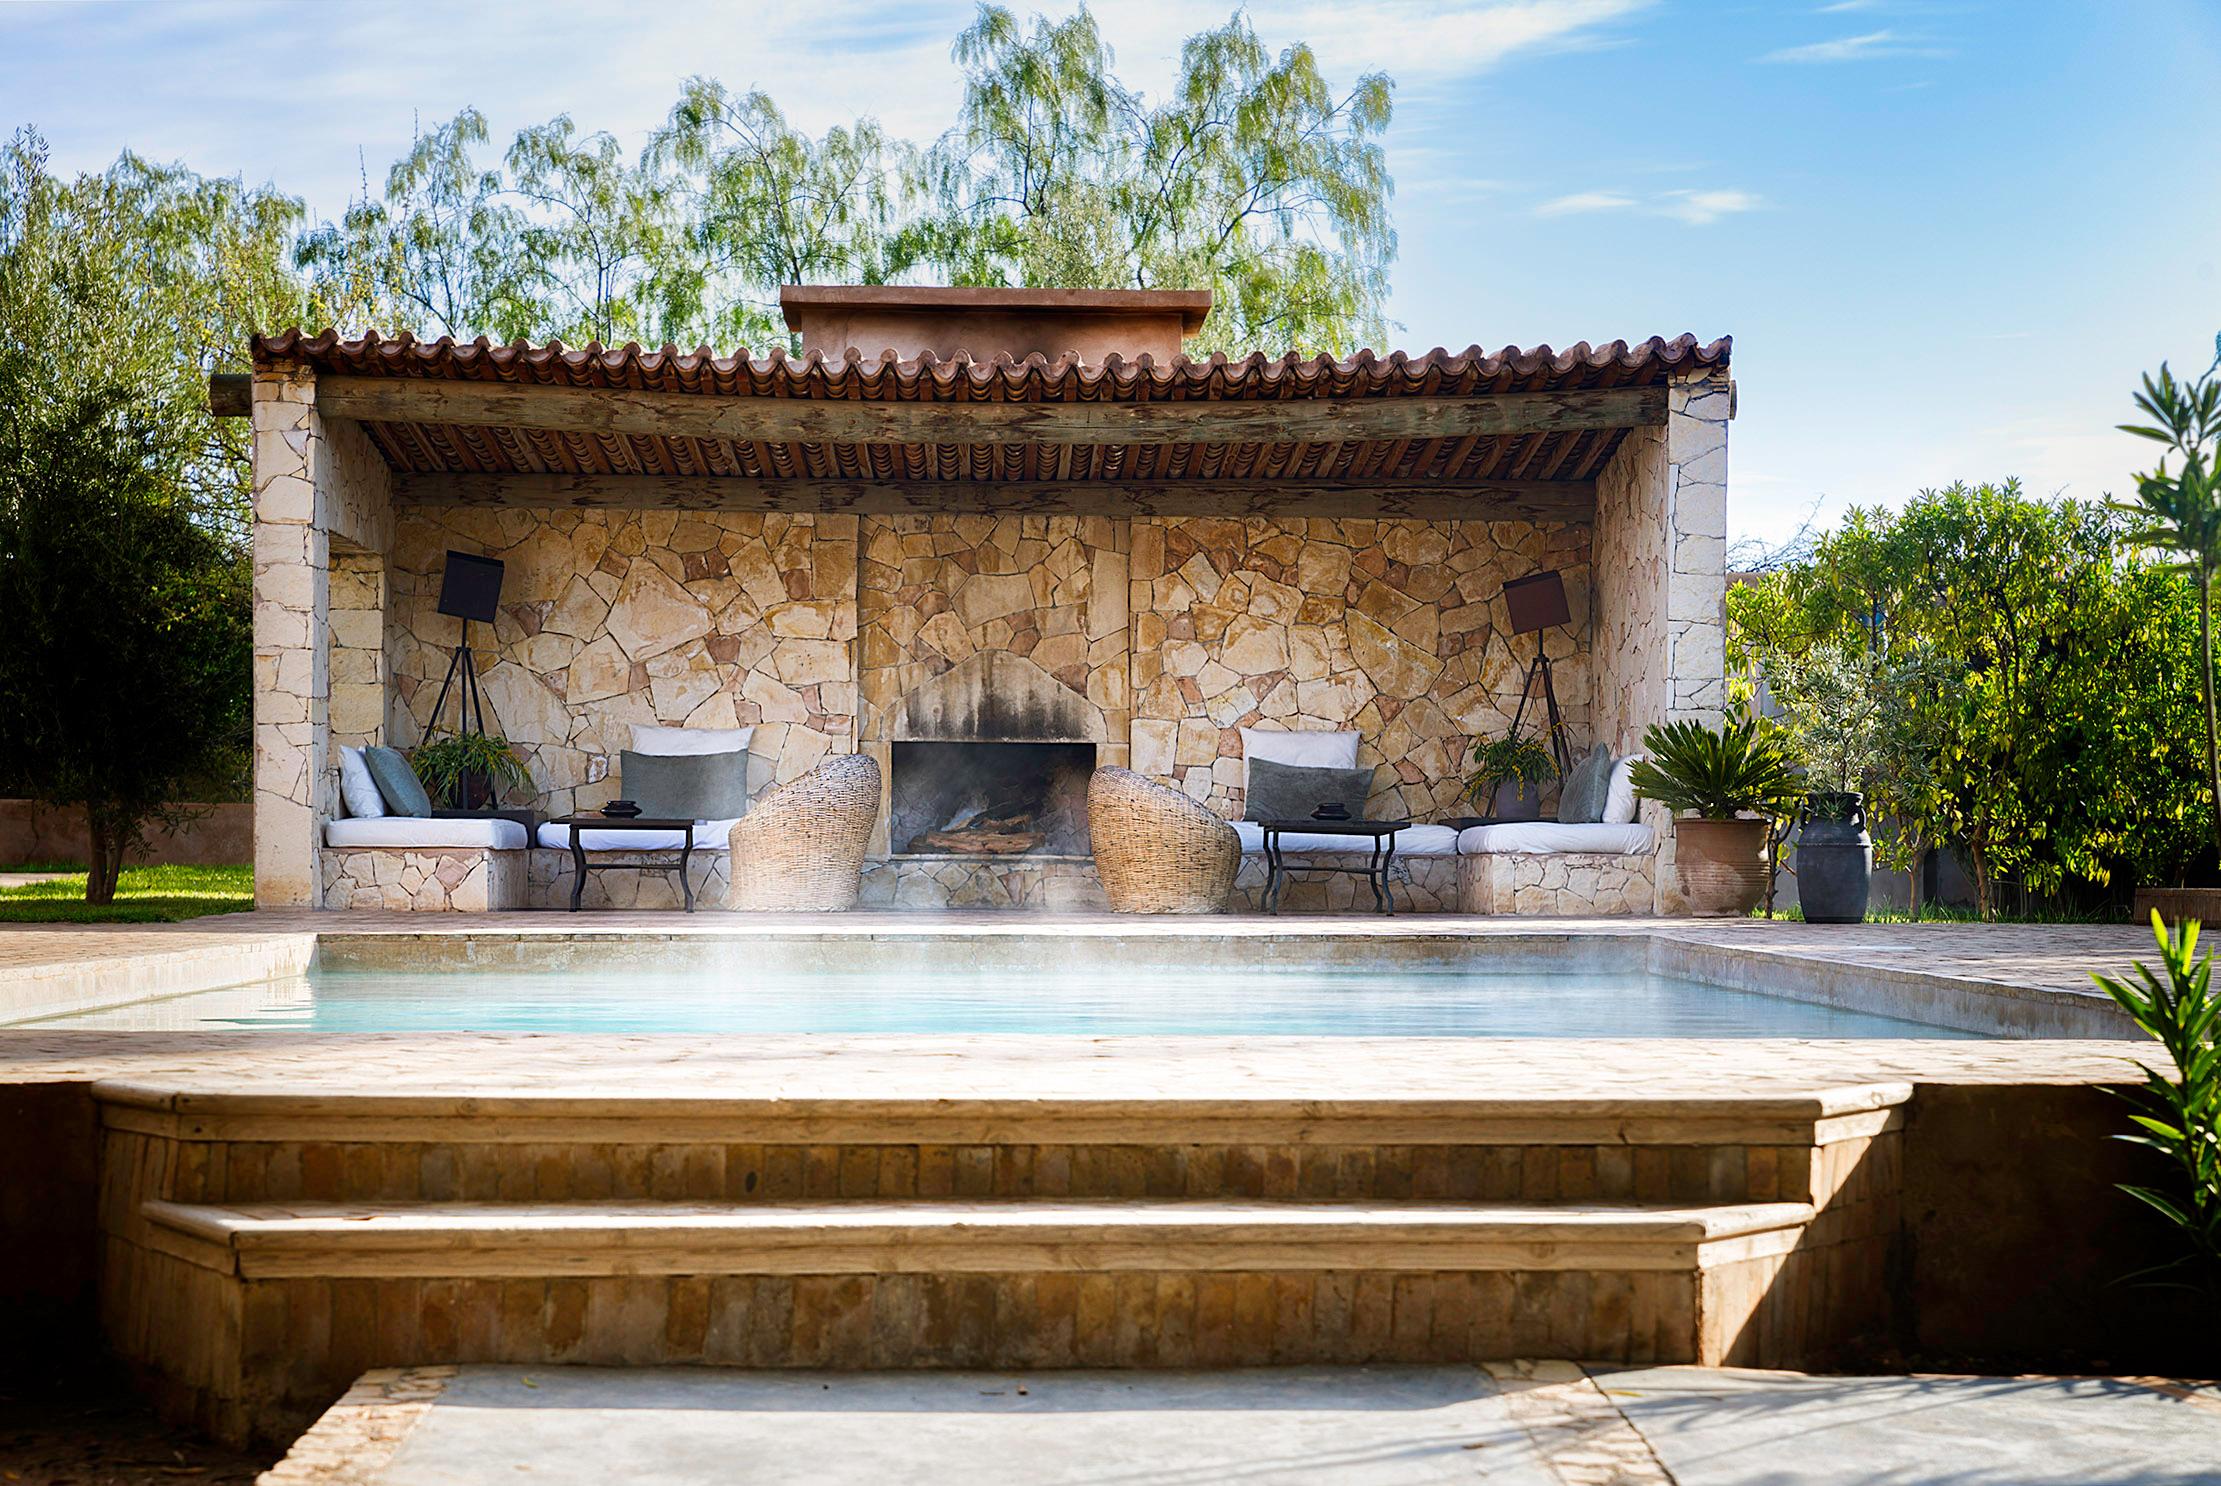 morocco heated swimming pool (1).jpg